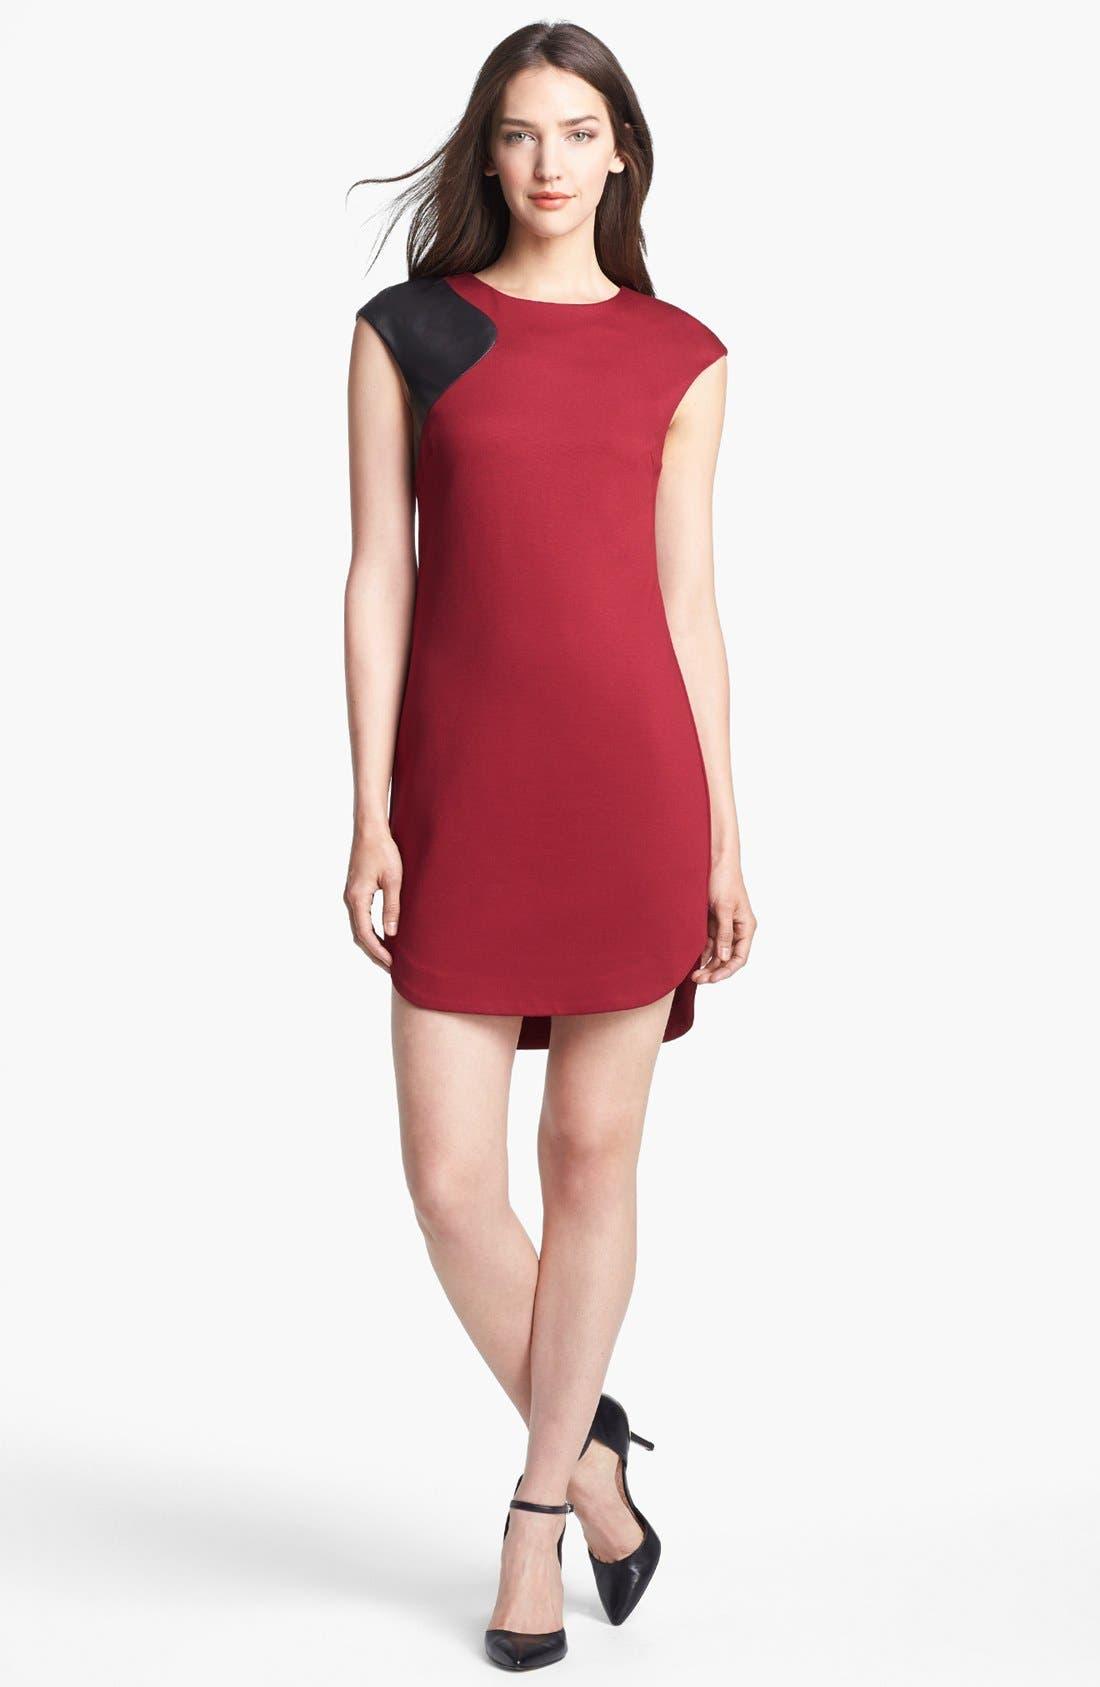 Alternate Image 1 Selected - Trina Turk 'Missy' Stretch Shift Dress